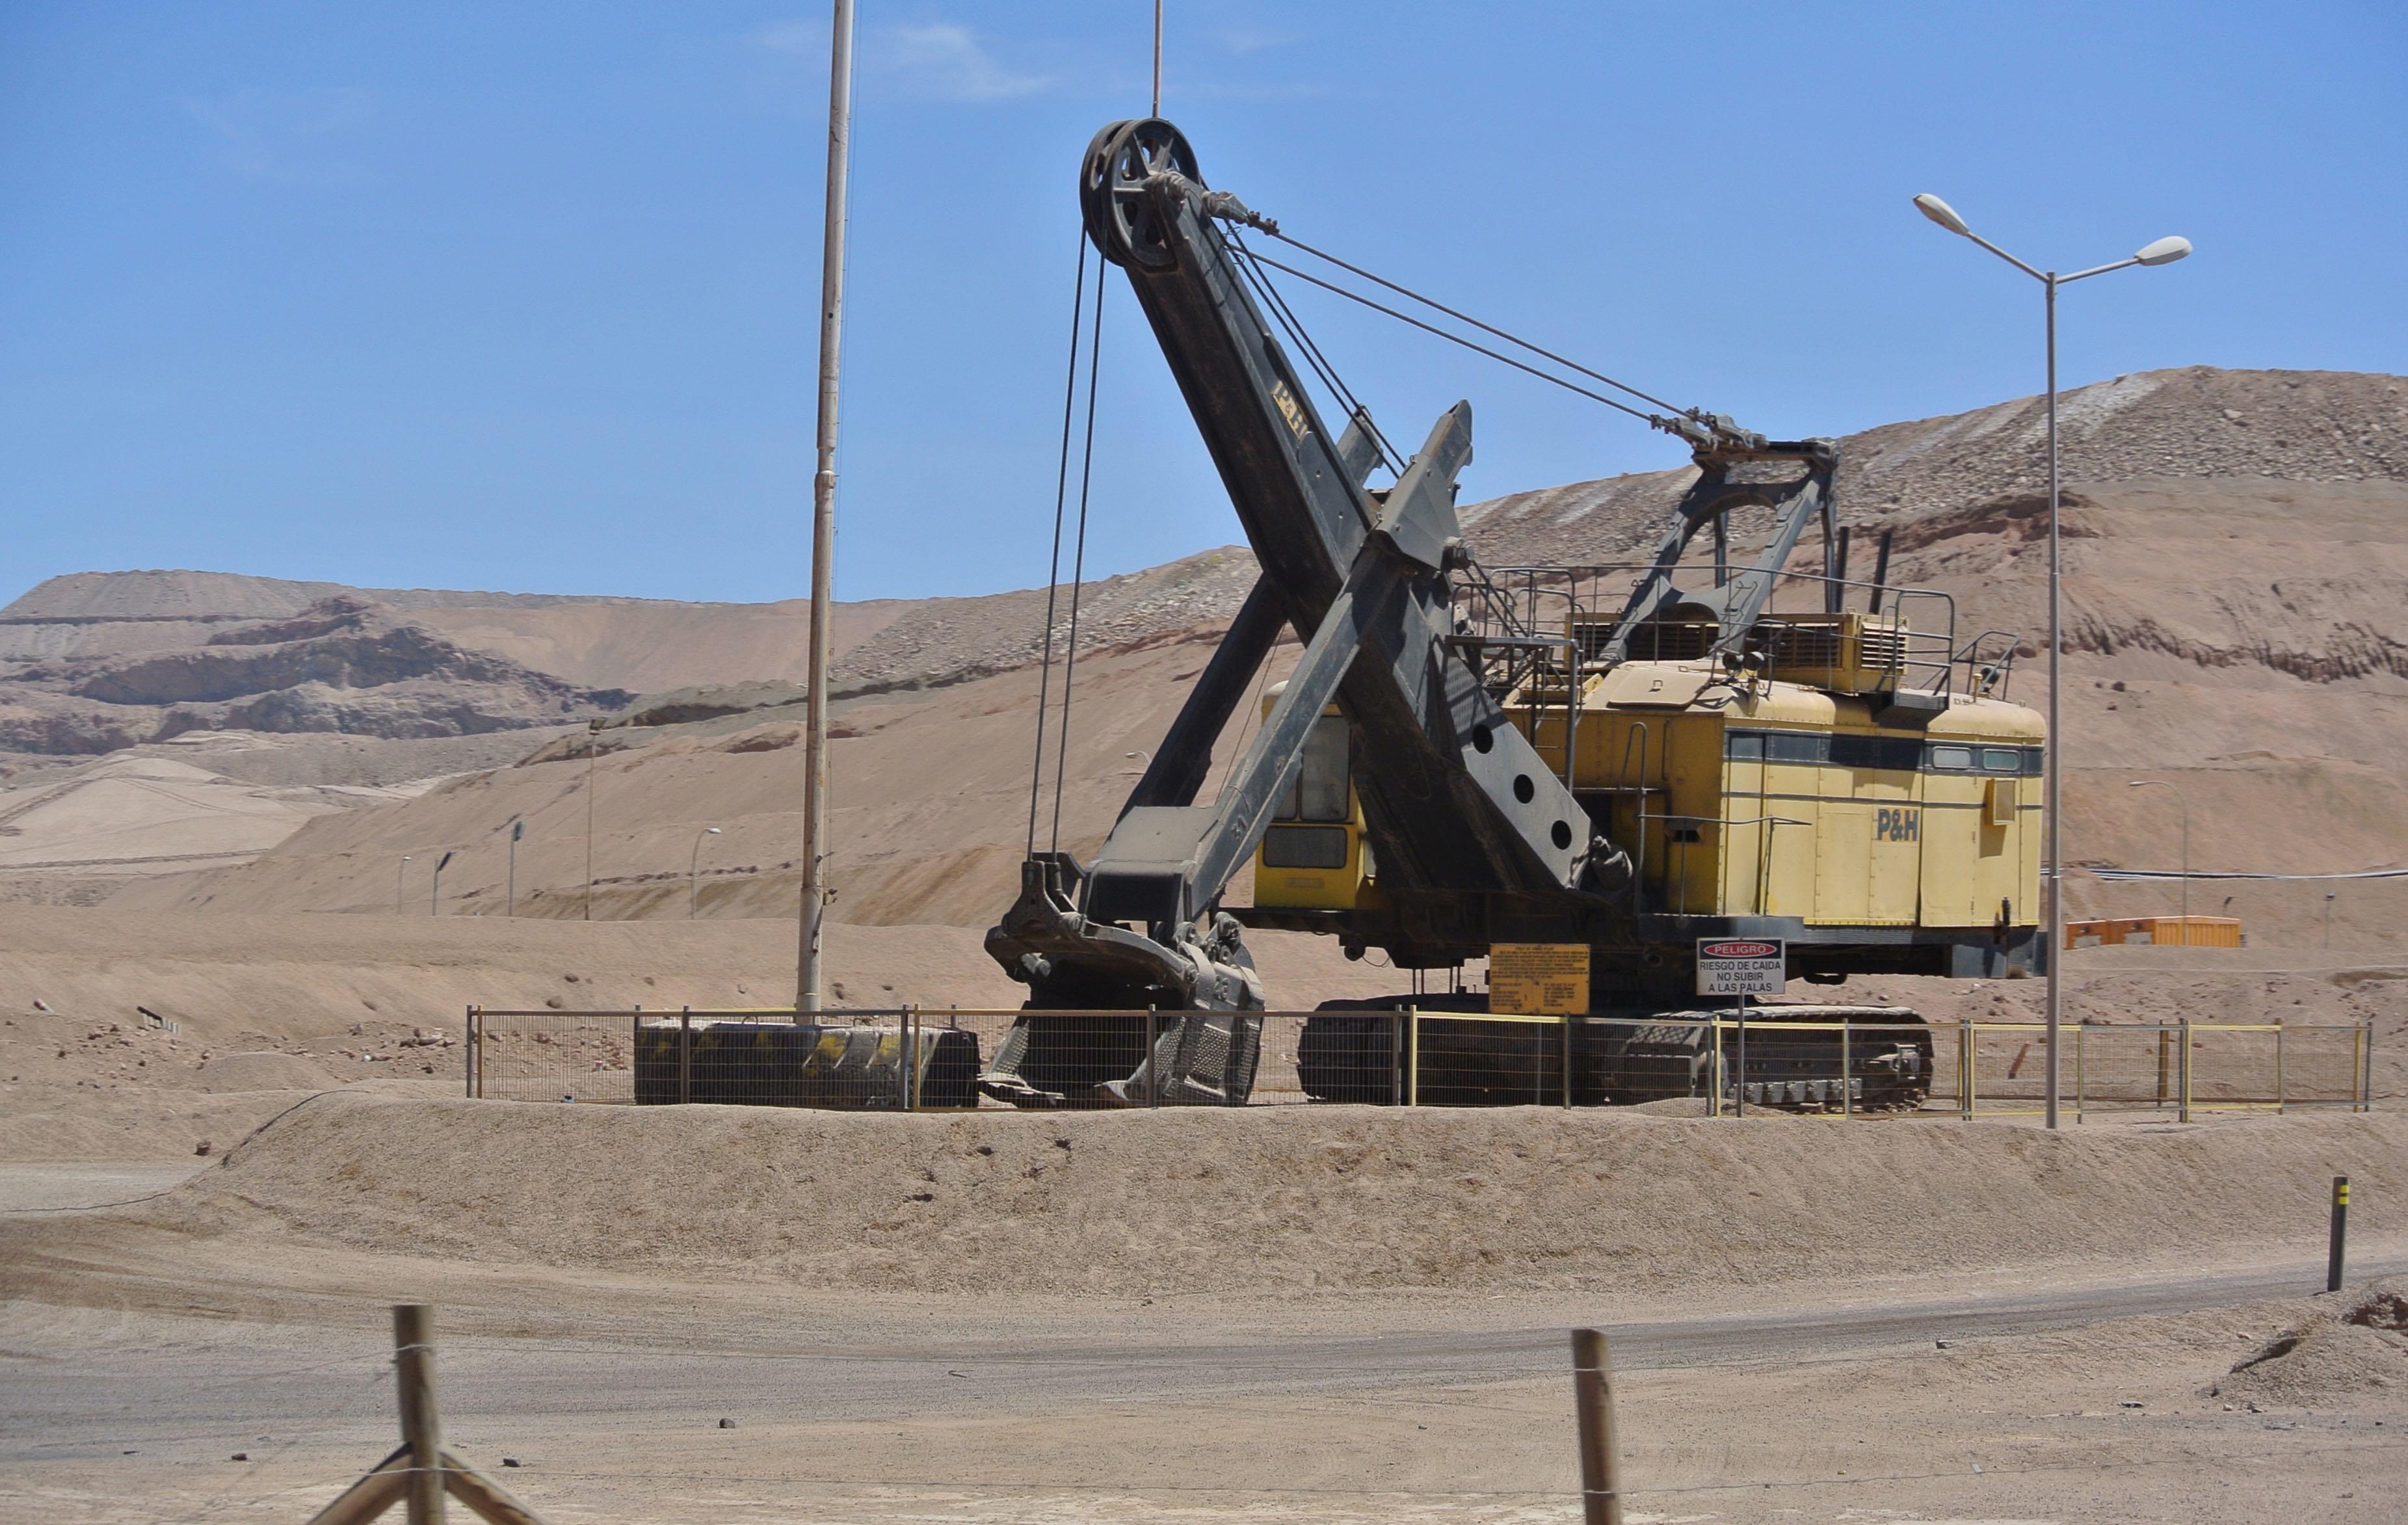 018 1612 Antofagasta 4jpeg